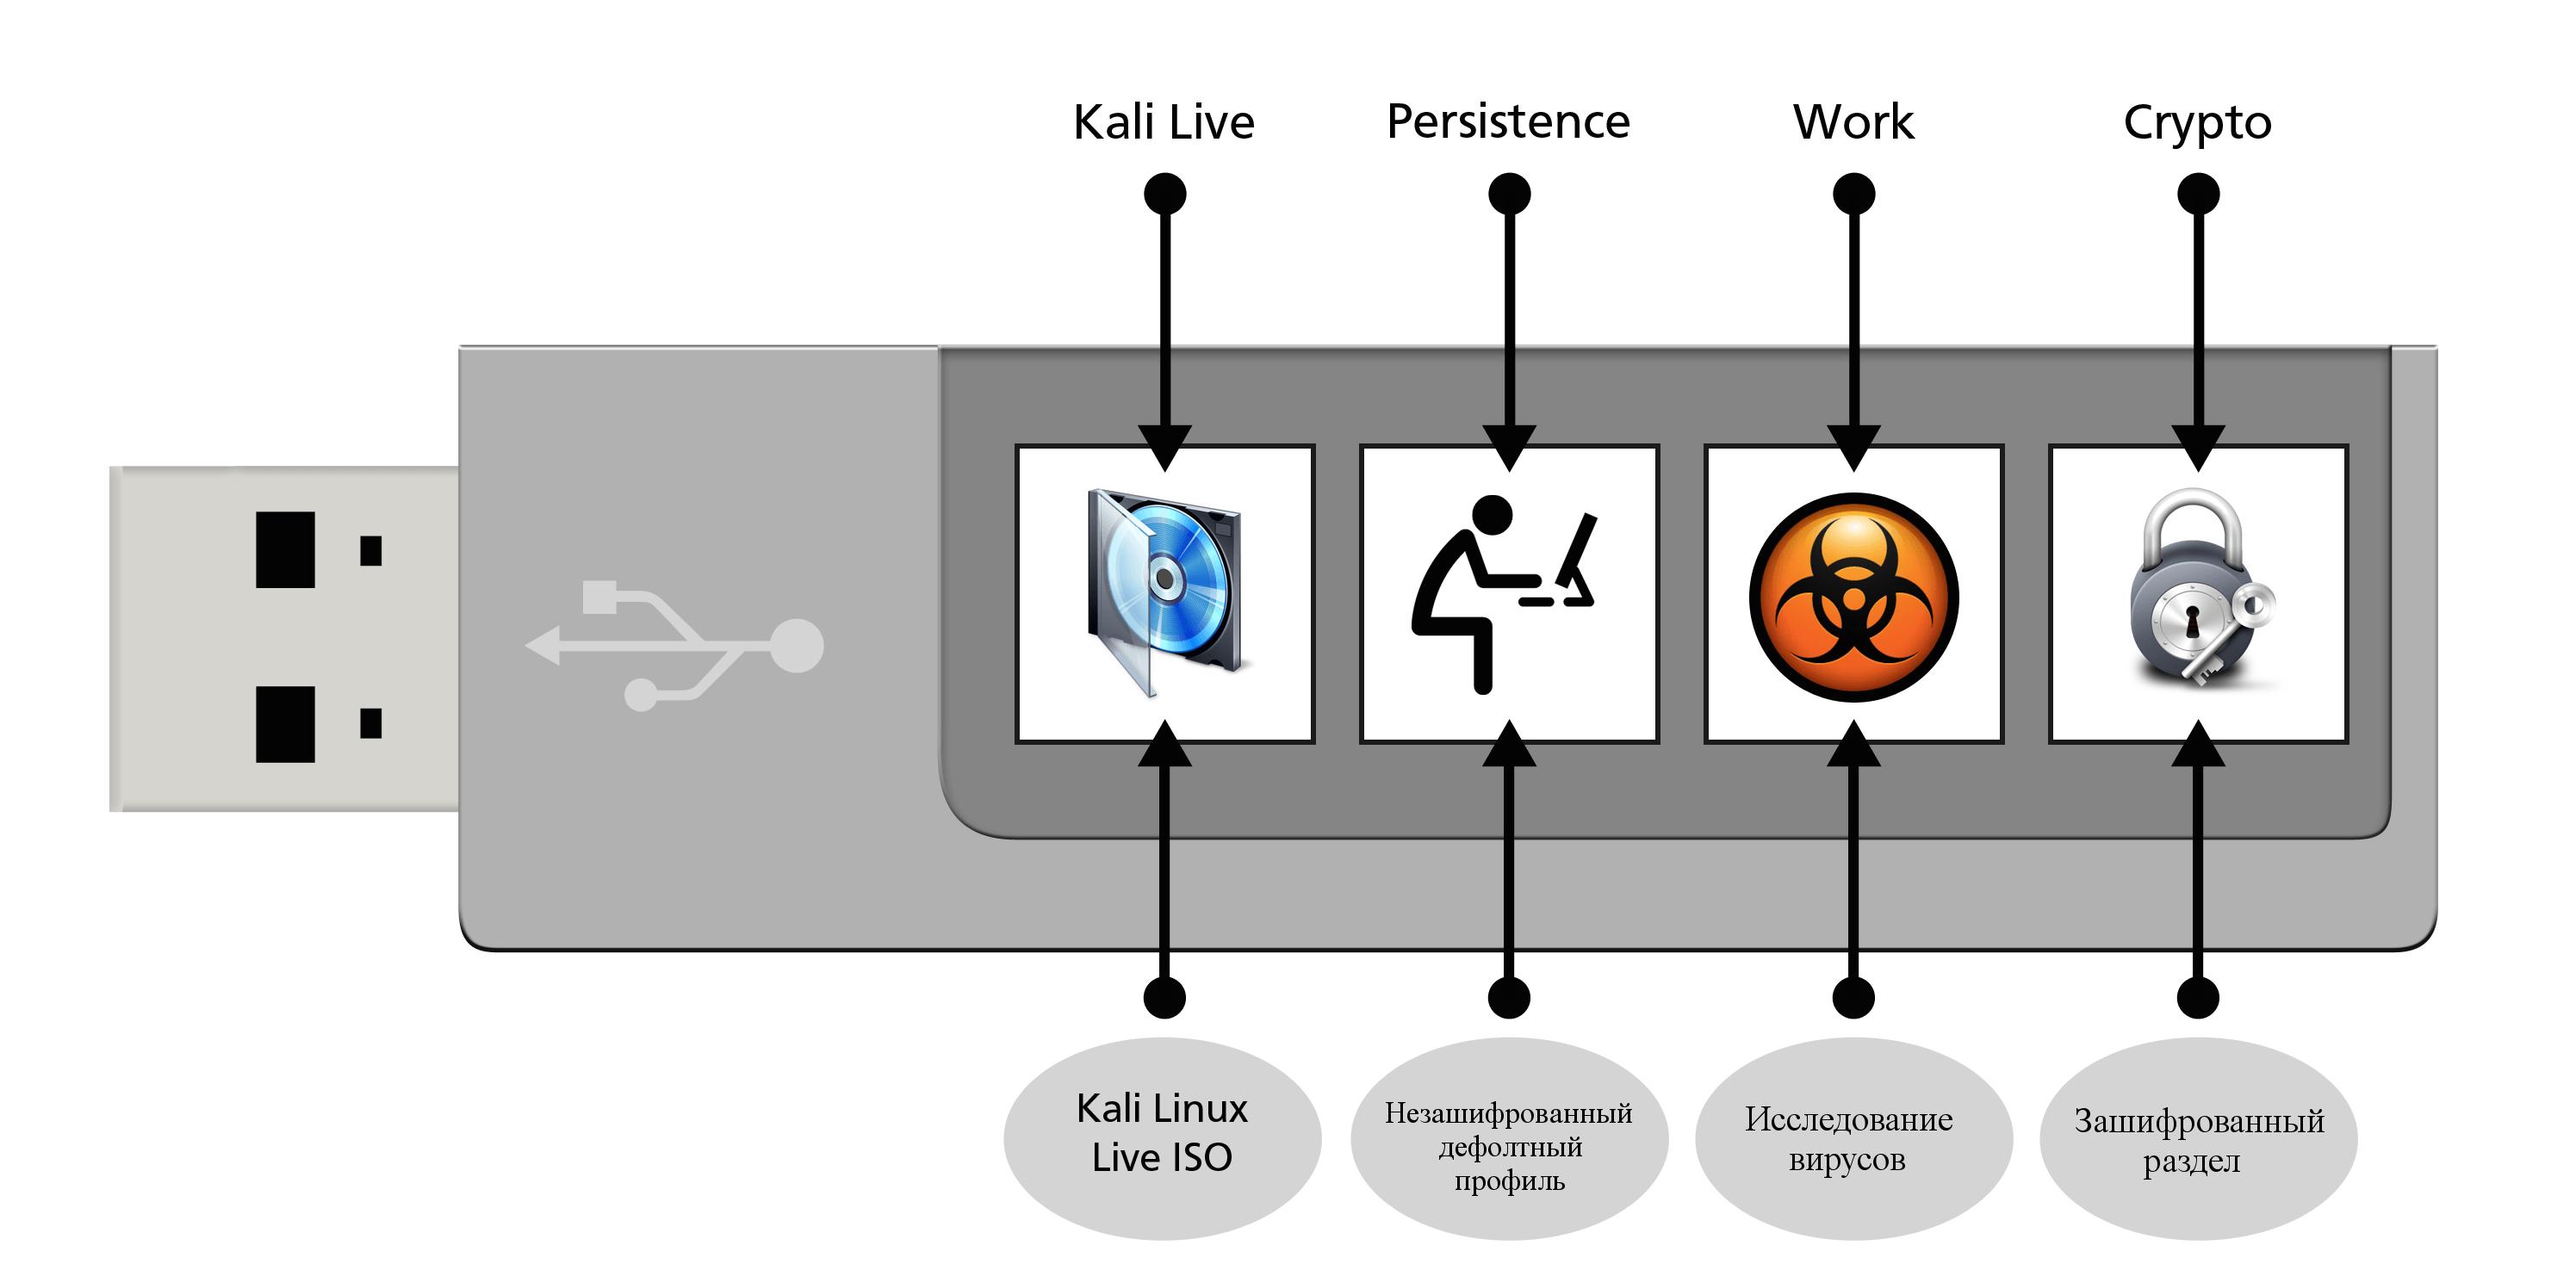 kali-multi-usb-persistence